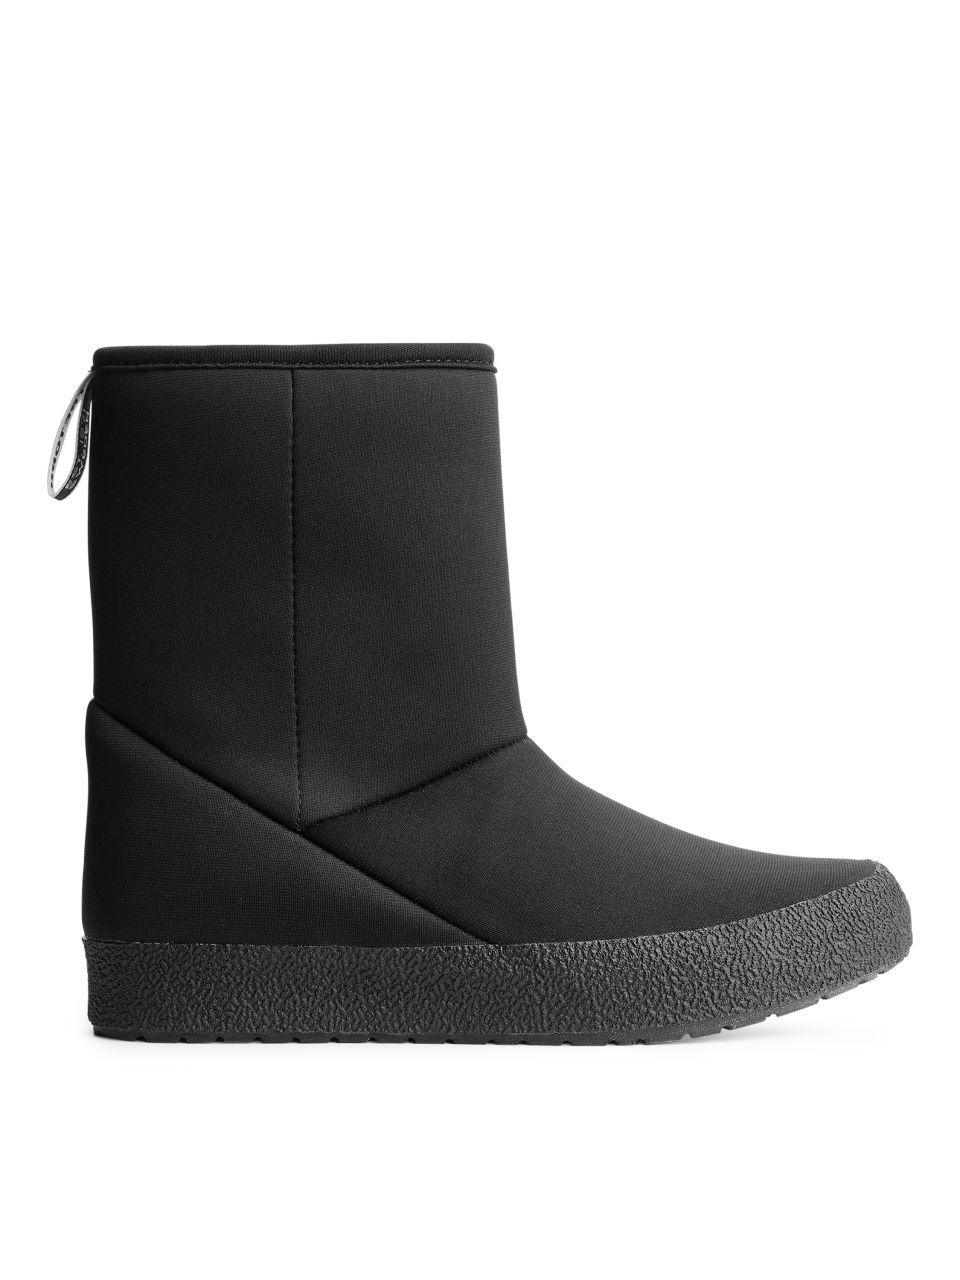 Tretorn Baffle Boots - Black